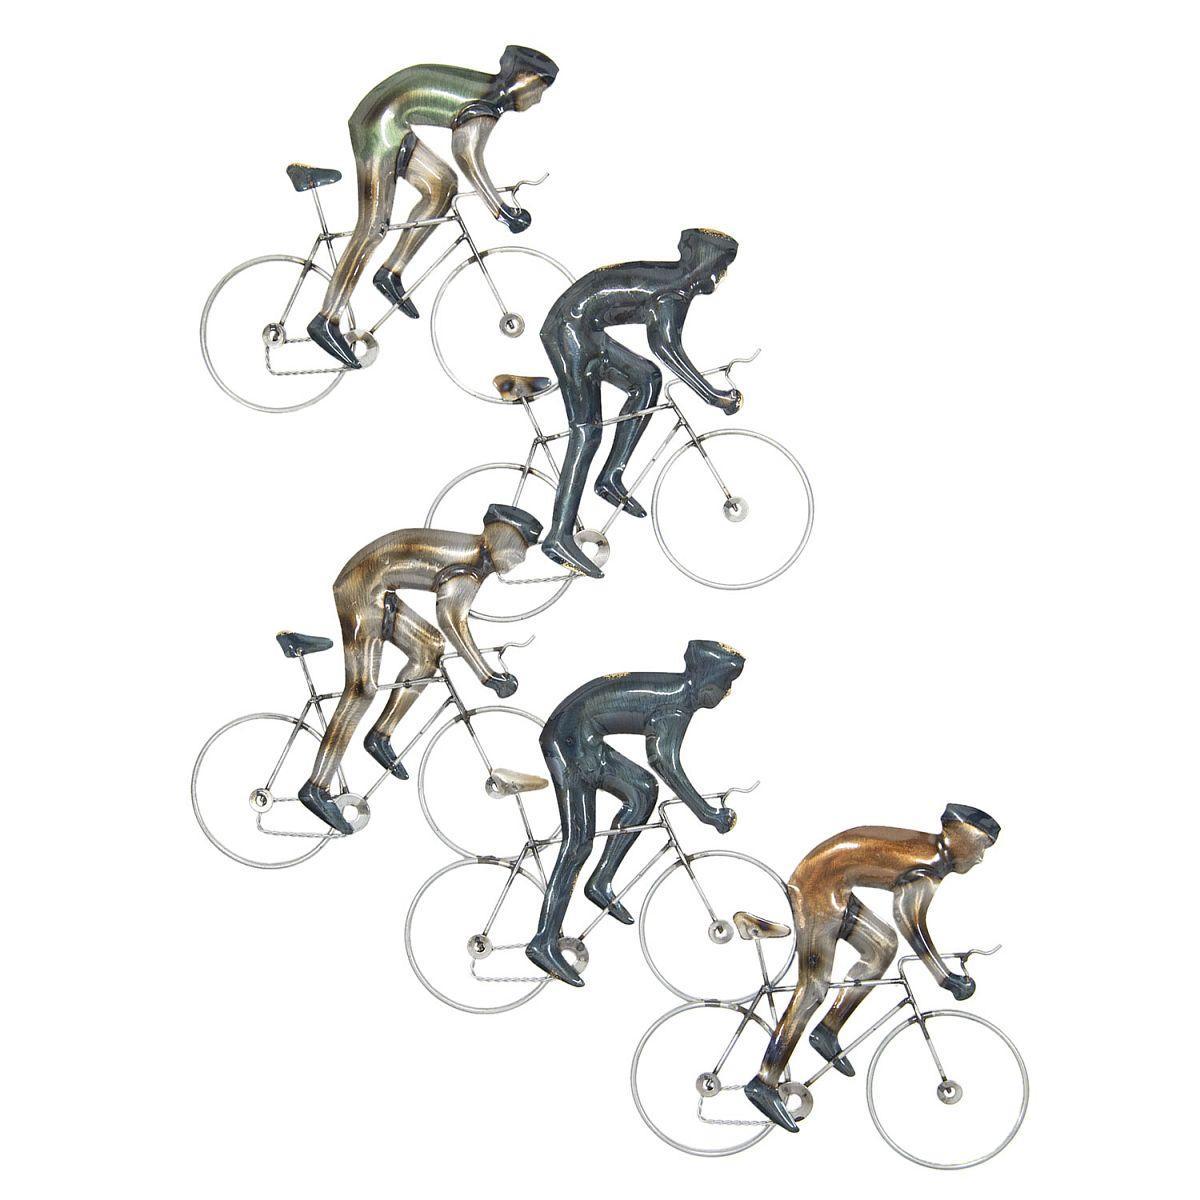 Nástěnná dekorace cyklisté